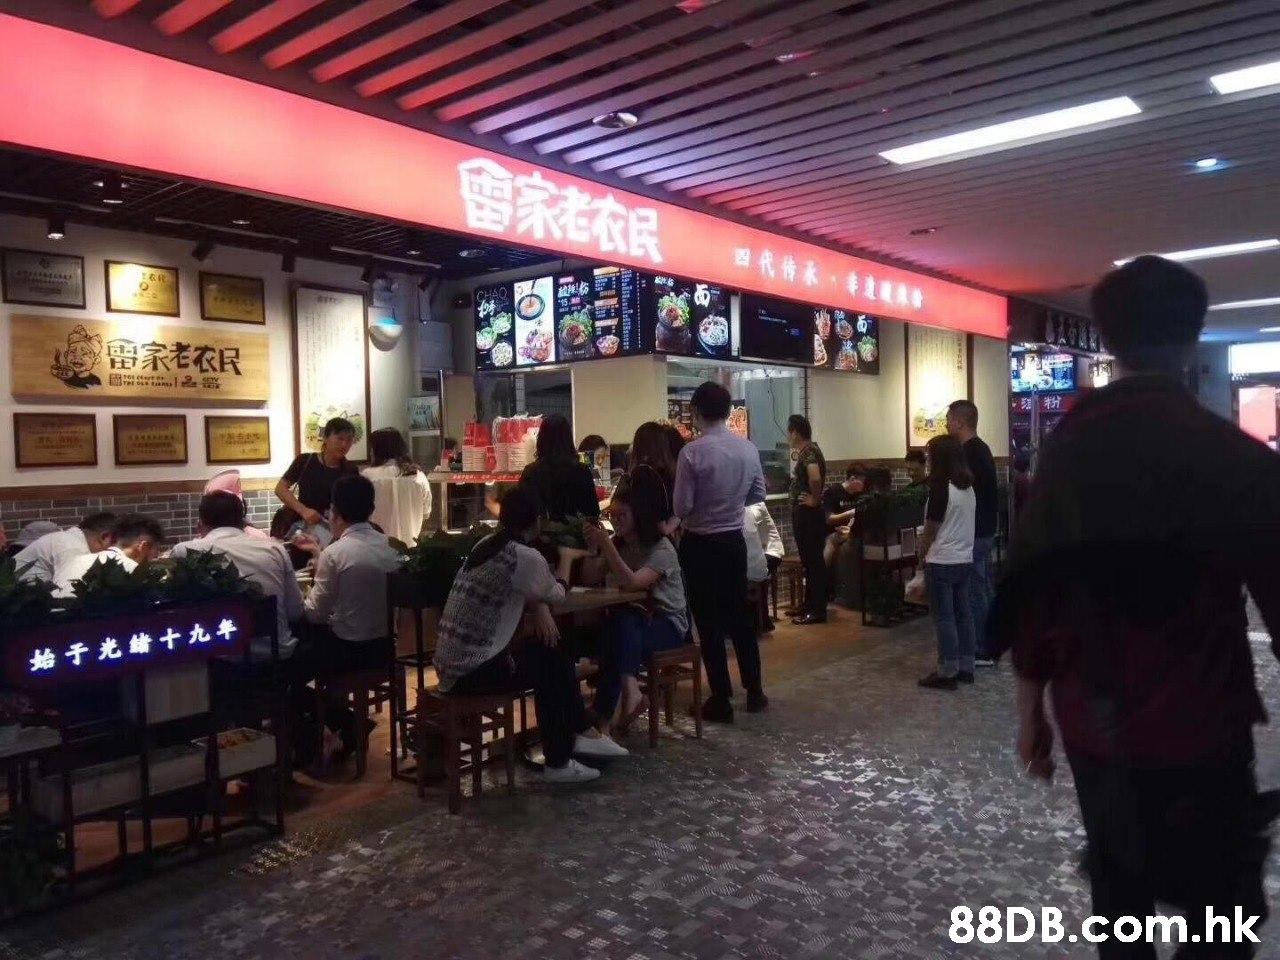 RERR CHAO RERR 始于光绪十九车 .hk,Building,Food court,Restaurant,Event,